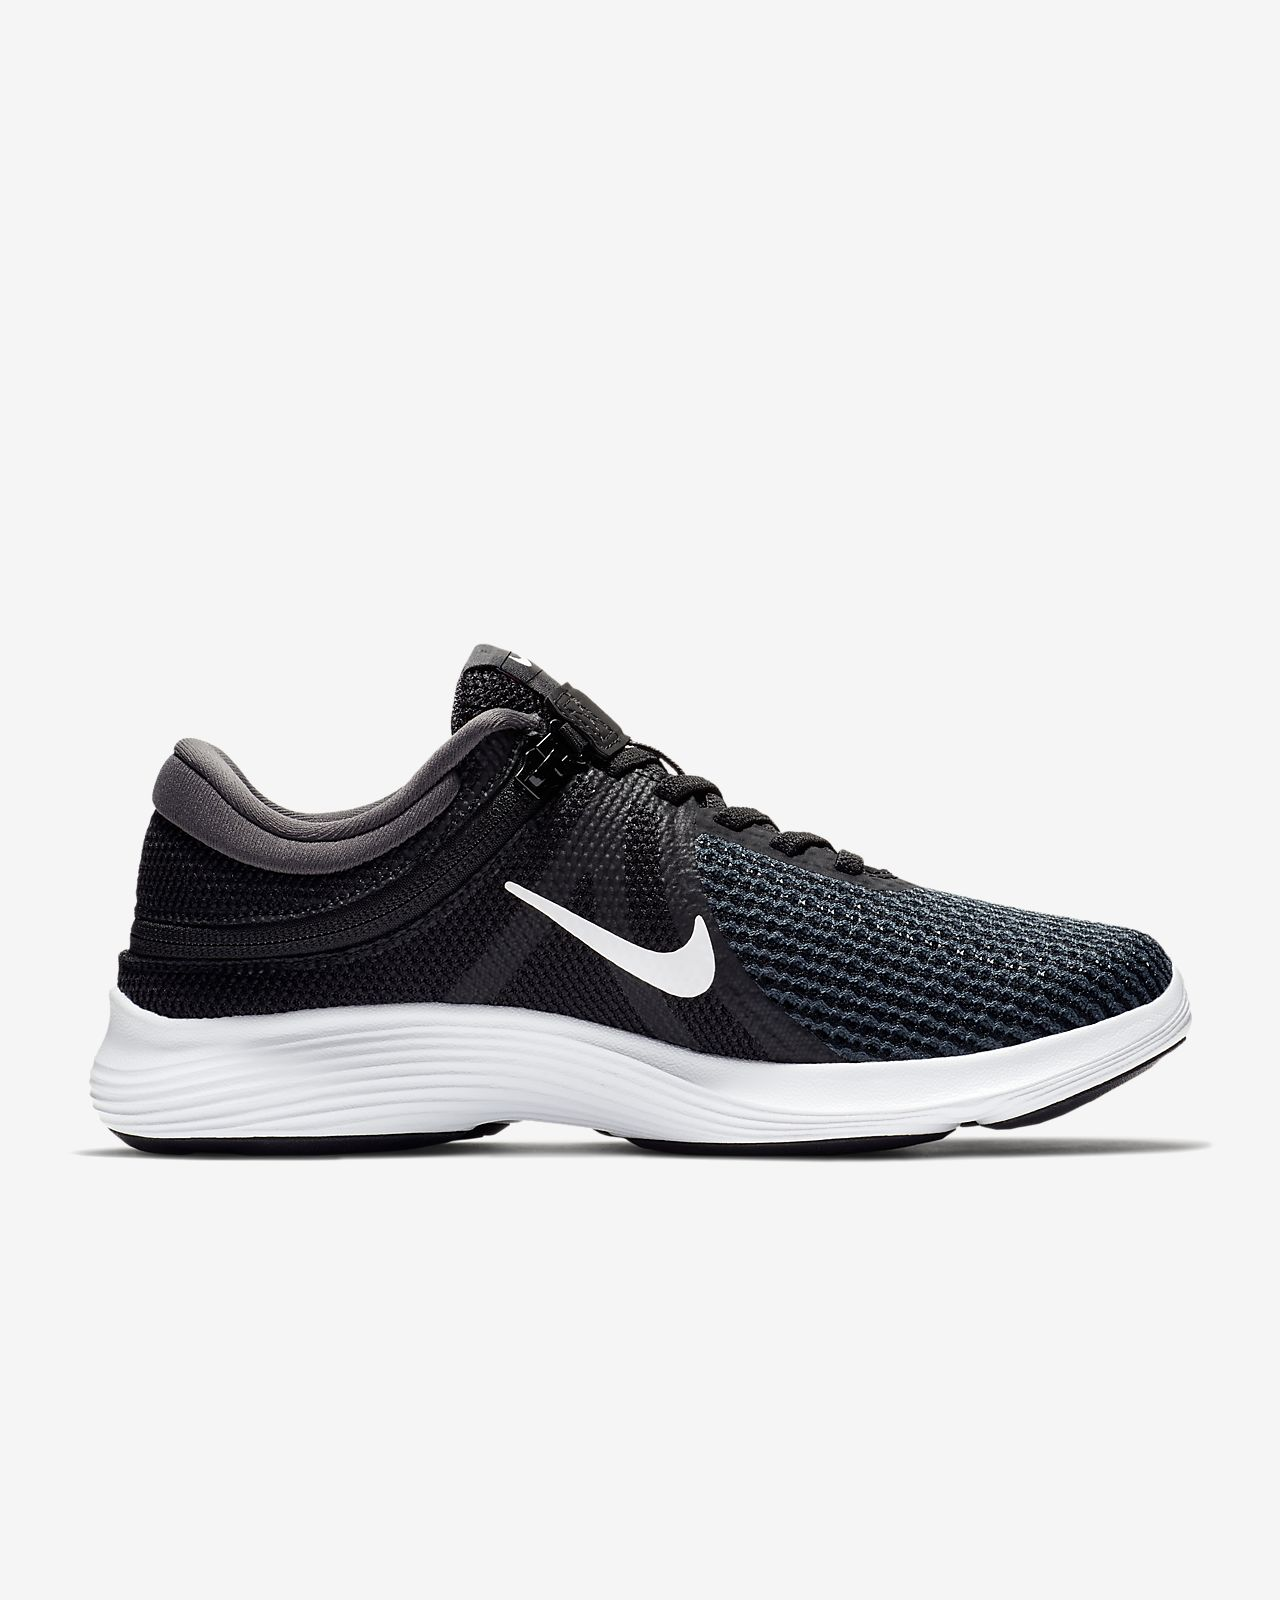 1d1e1fd680c Женские беговые кроссовки Nike Revolution 4 FlyEase. Nike.com RU